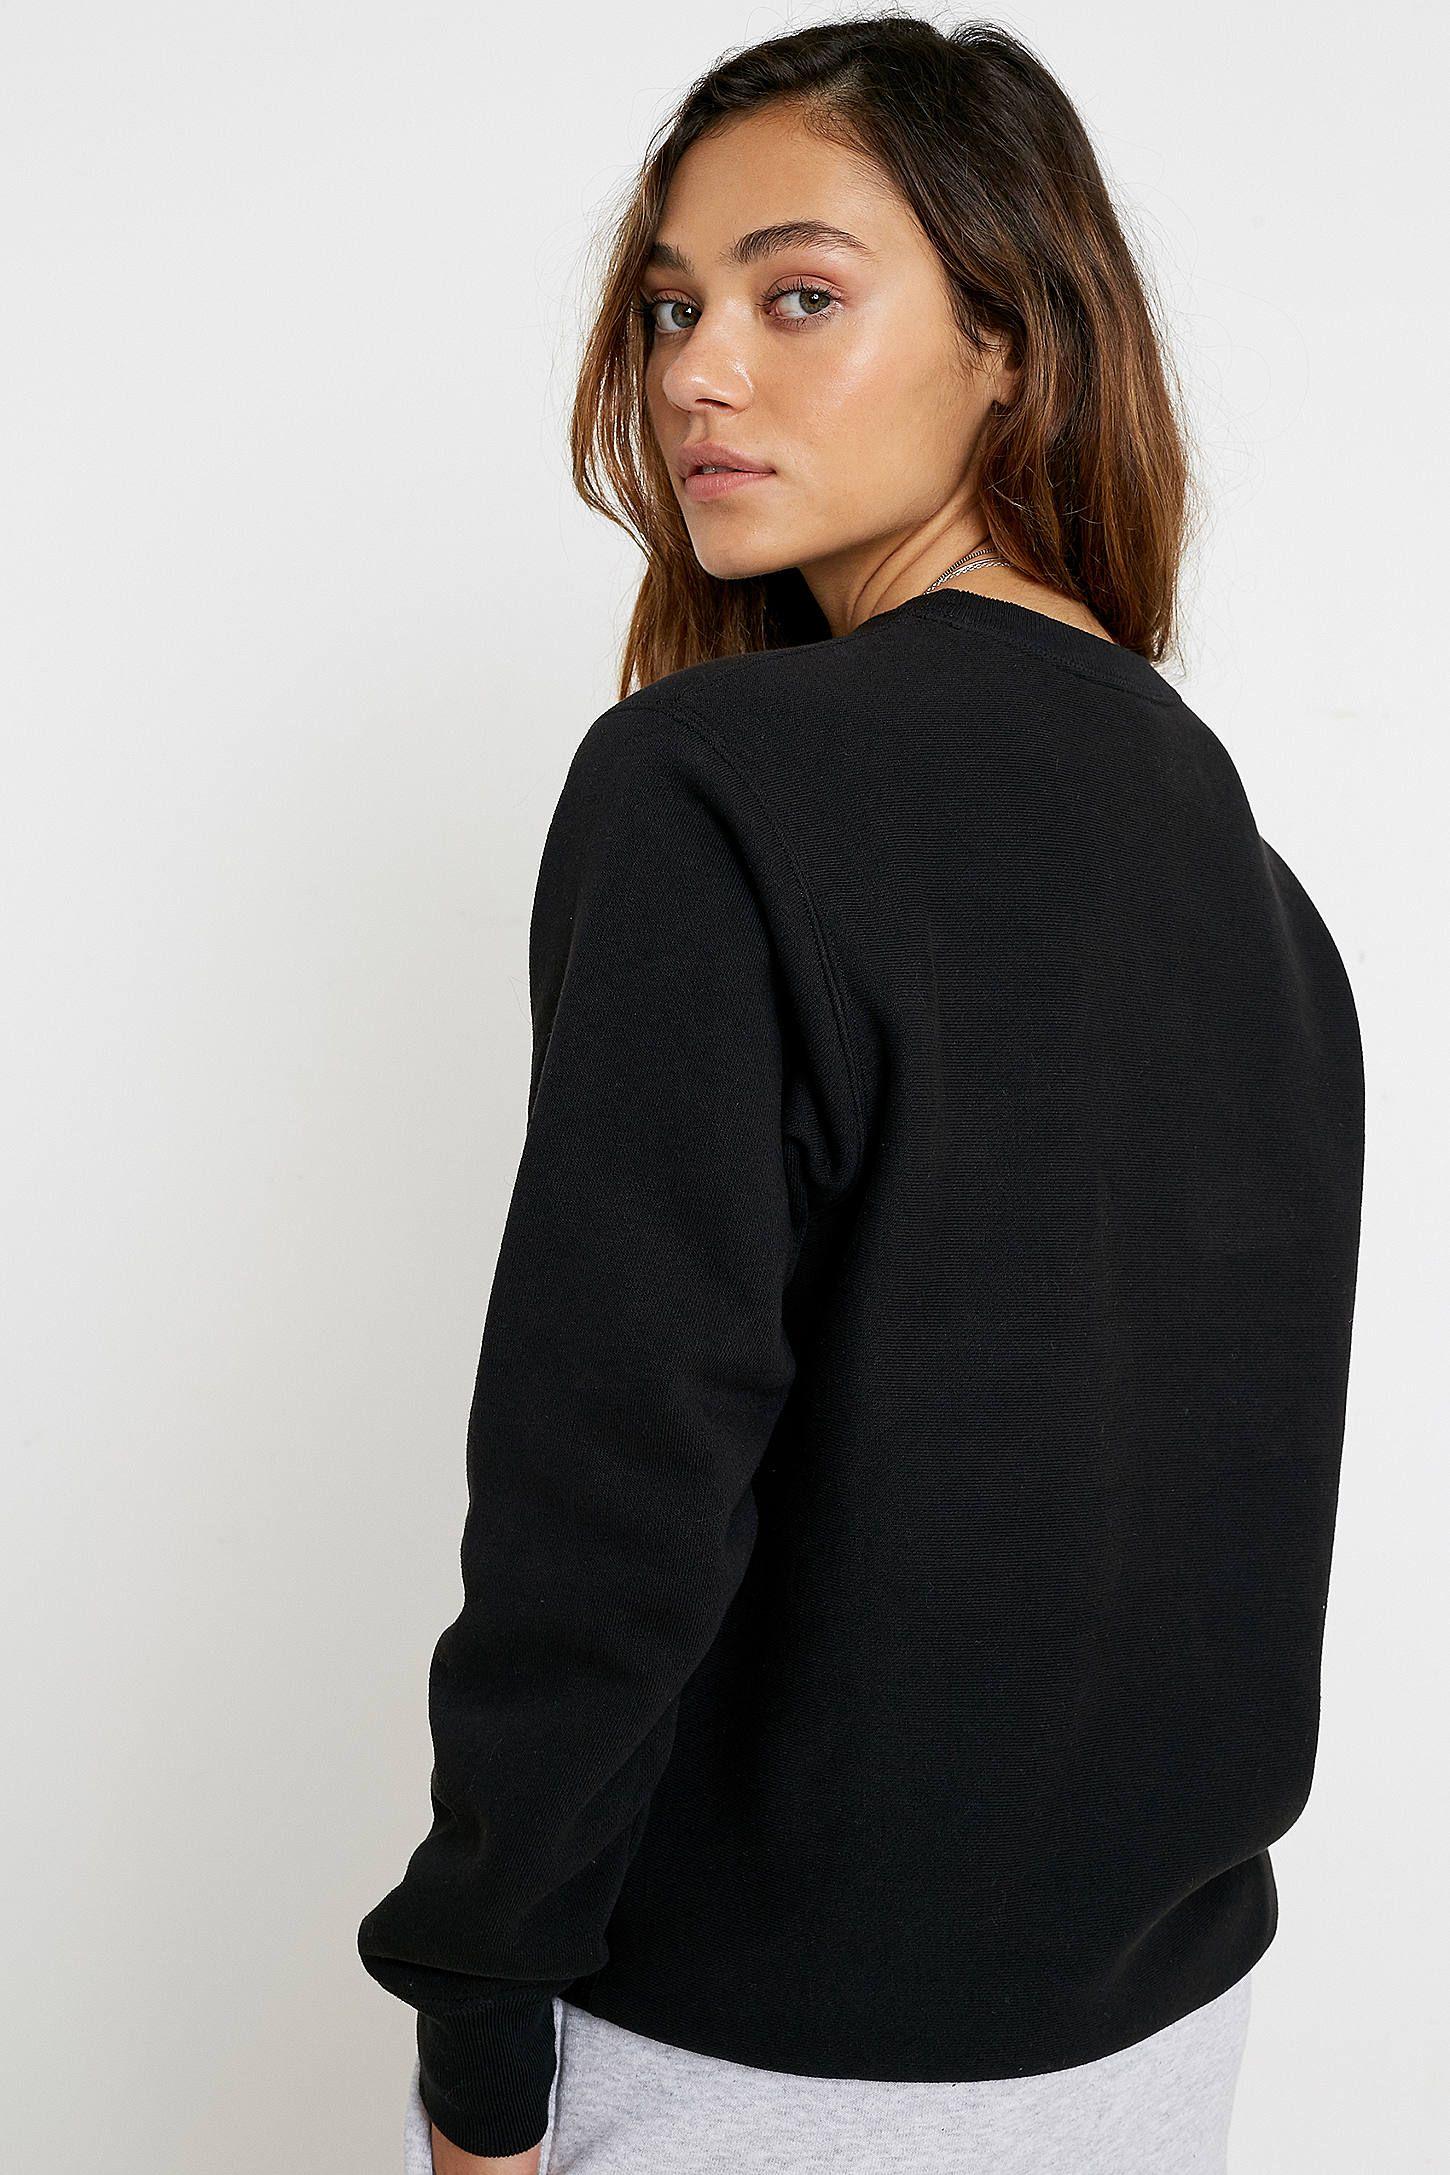 Champion Uo Exclusive Triple Script Logo Black Crew Neck Sweatshirt Urban Outfitters Uk Champion Clothing Clothes For Women Women [ 2175 x 1450 Pixel ]